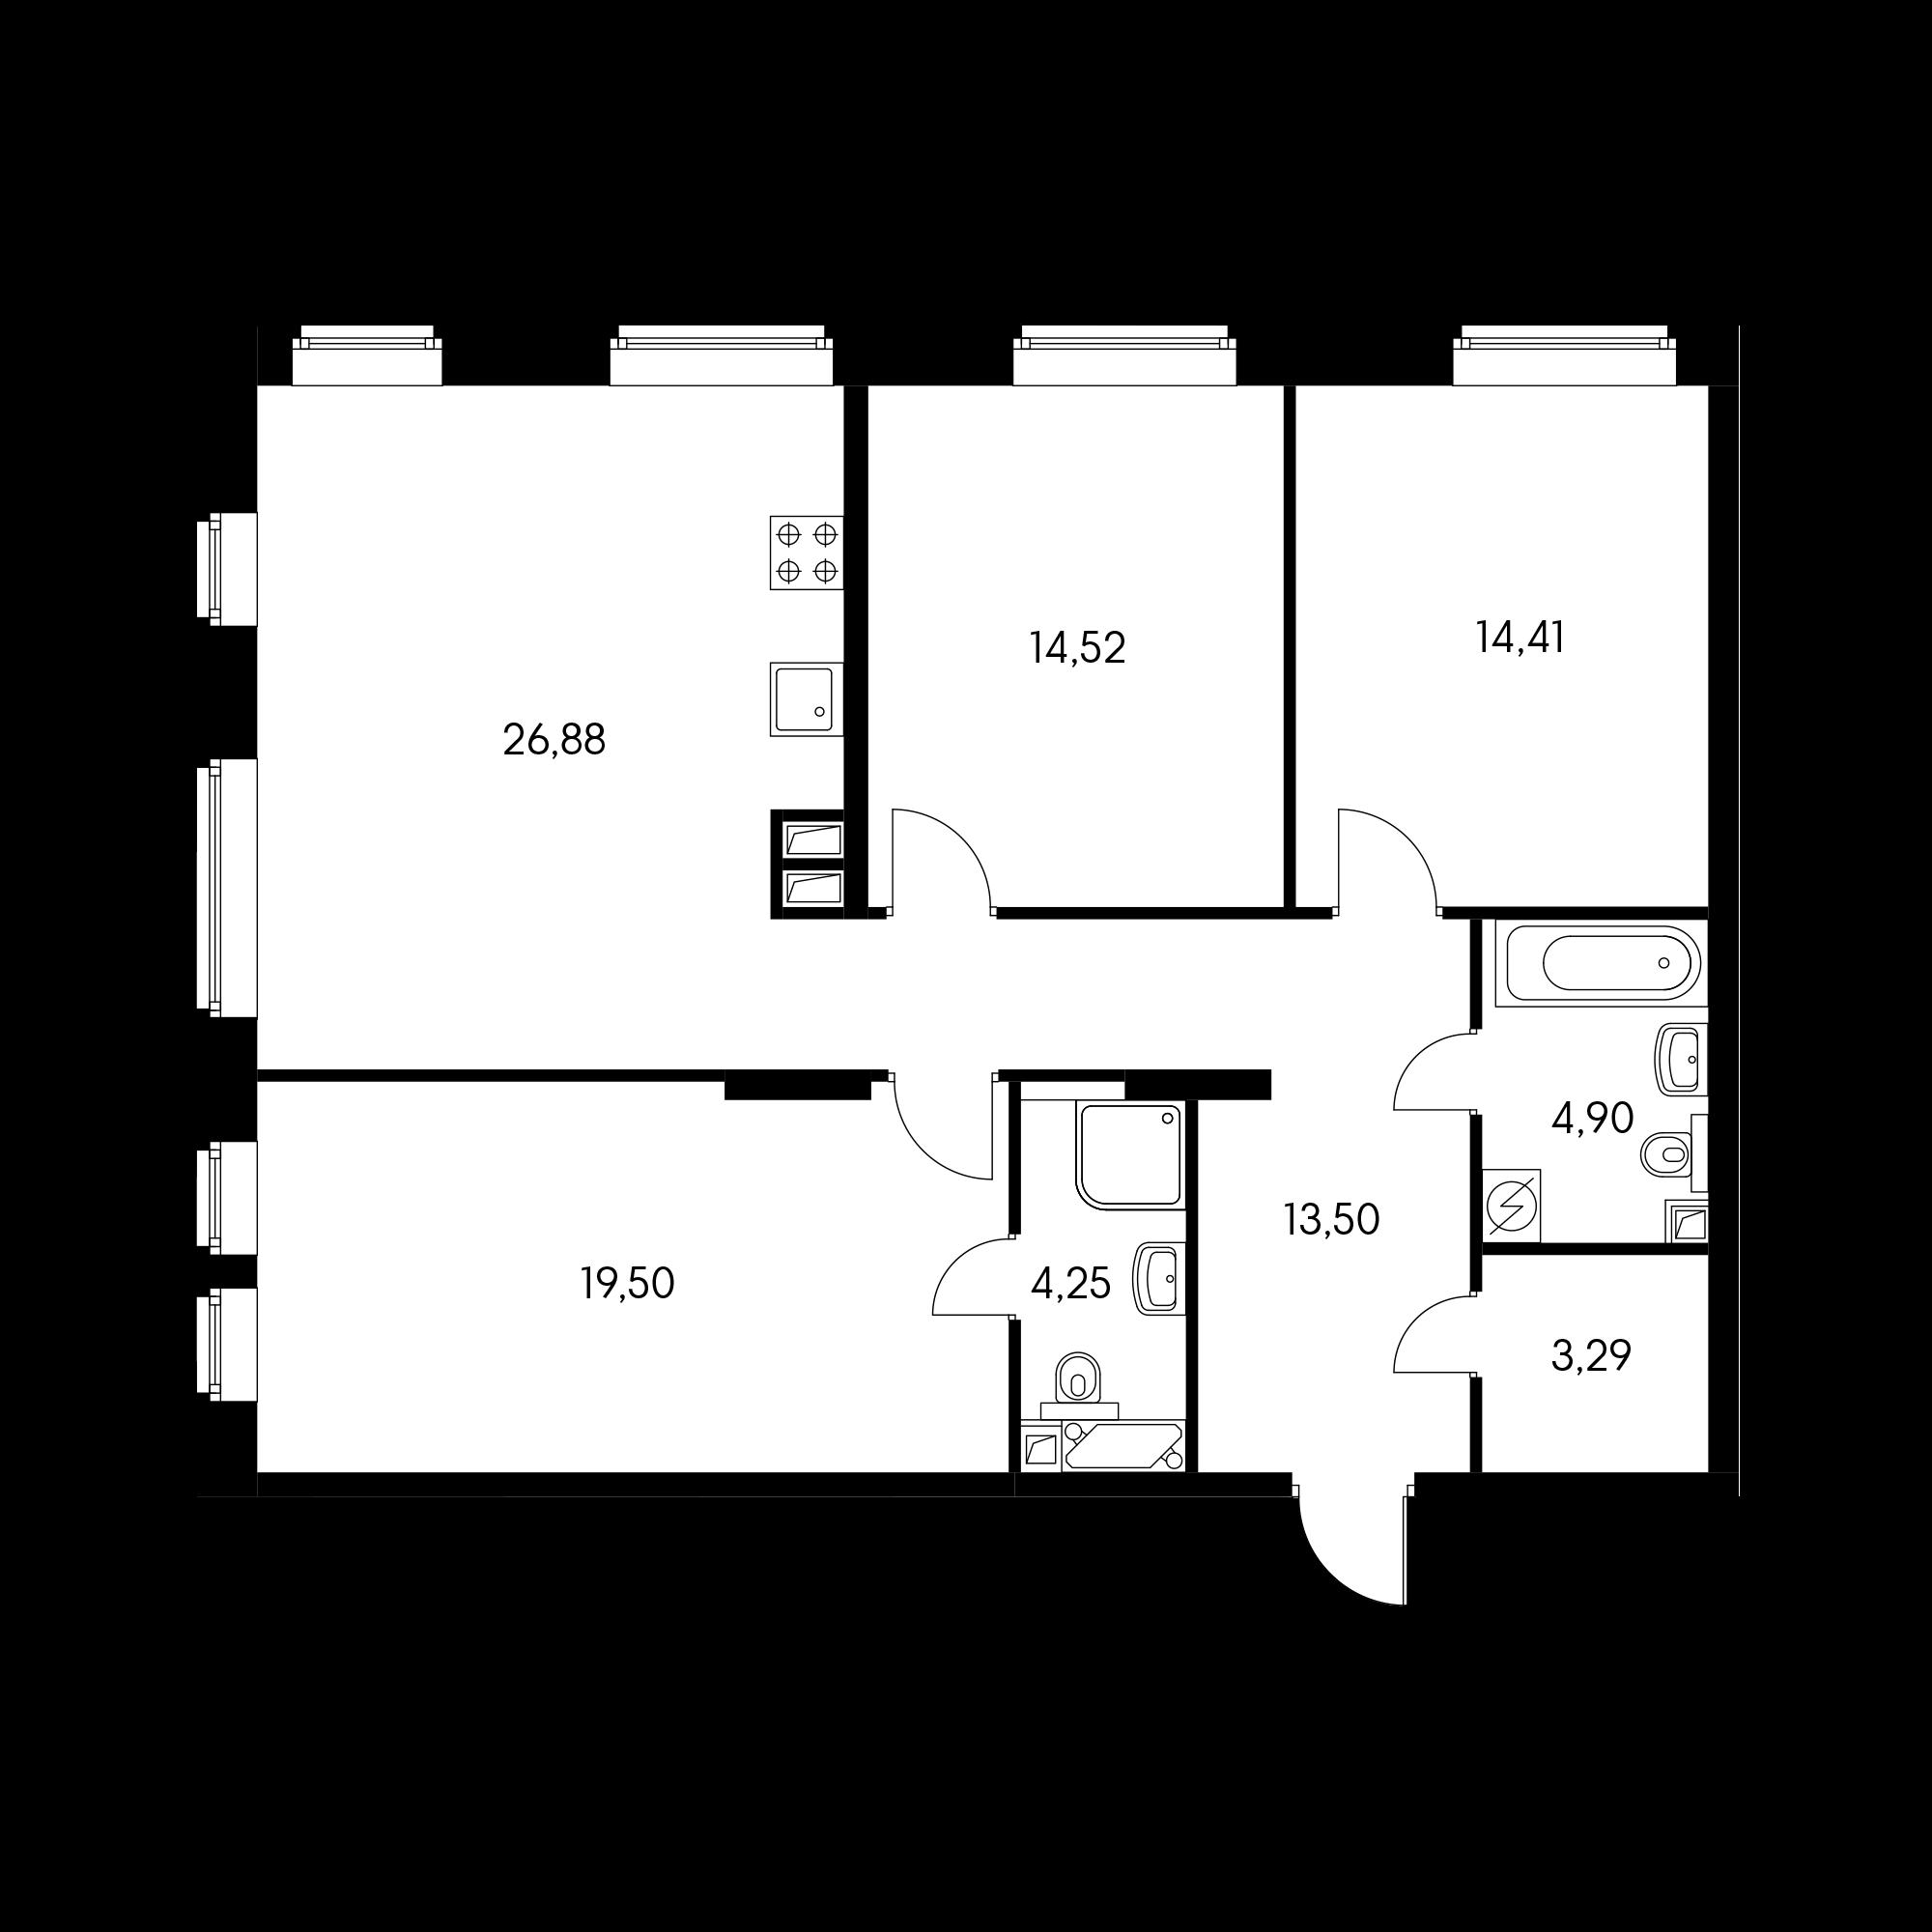 3EL3_3